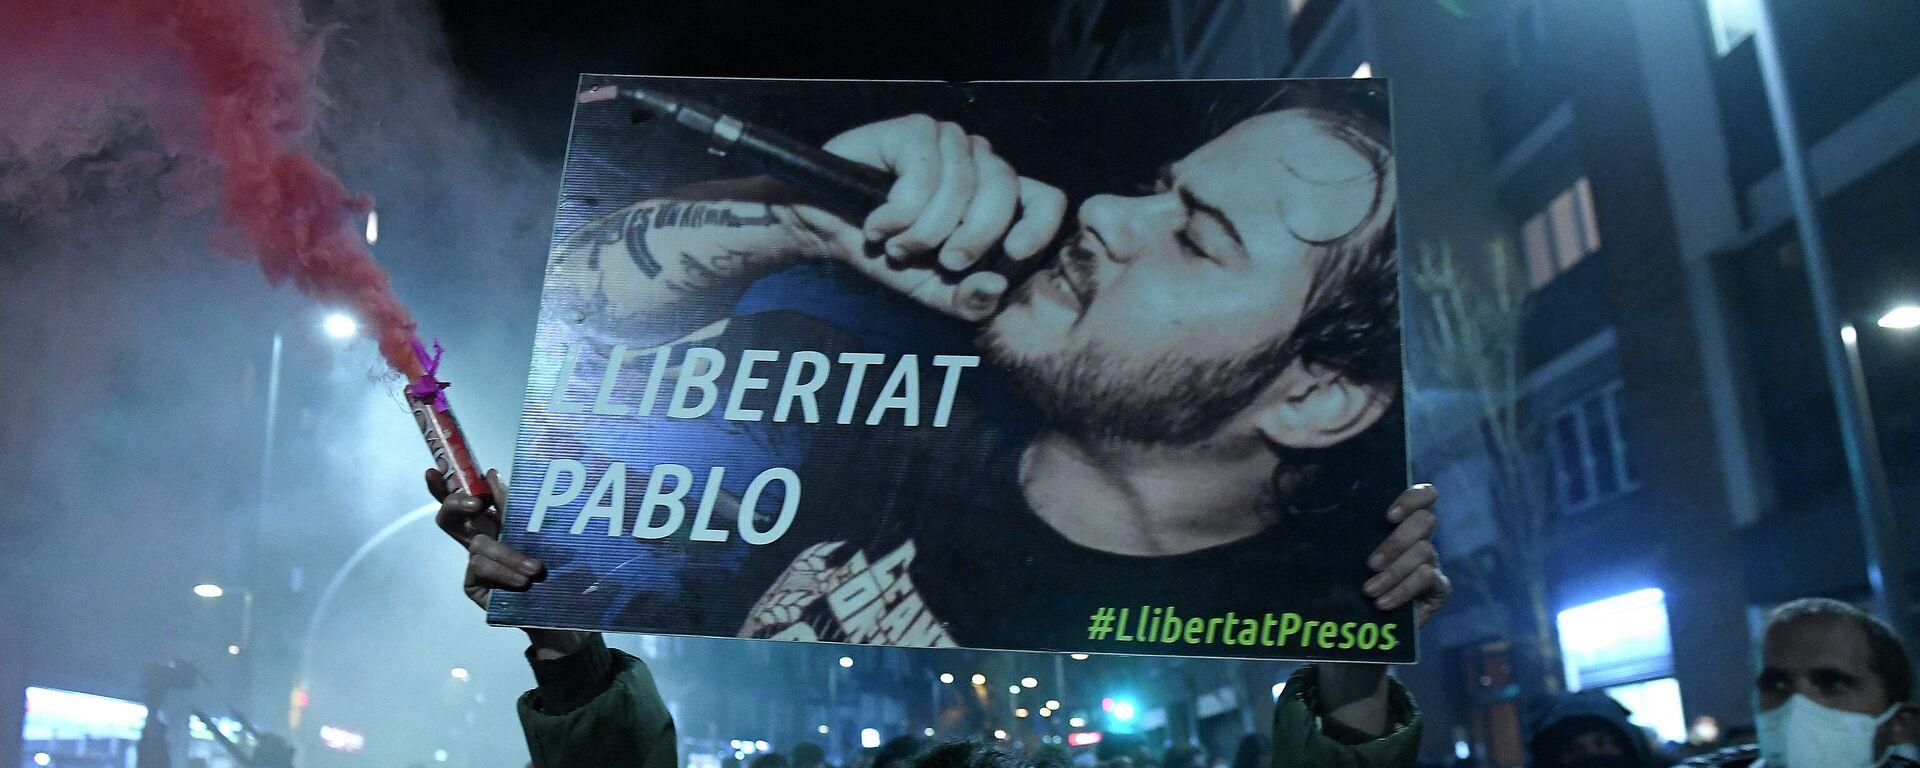 Manifestación a favor de Pablo Hasél. Barcelona, 16 de febrero de 2021 - Sputnik Mundo, 1920, 17.02.2021